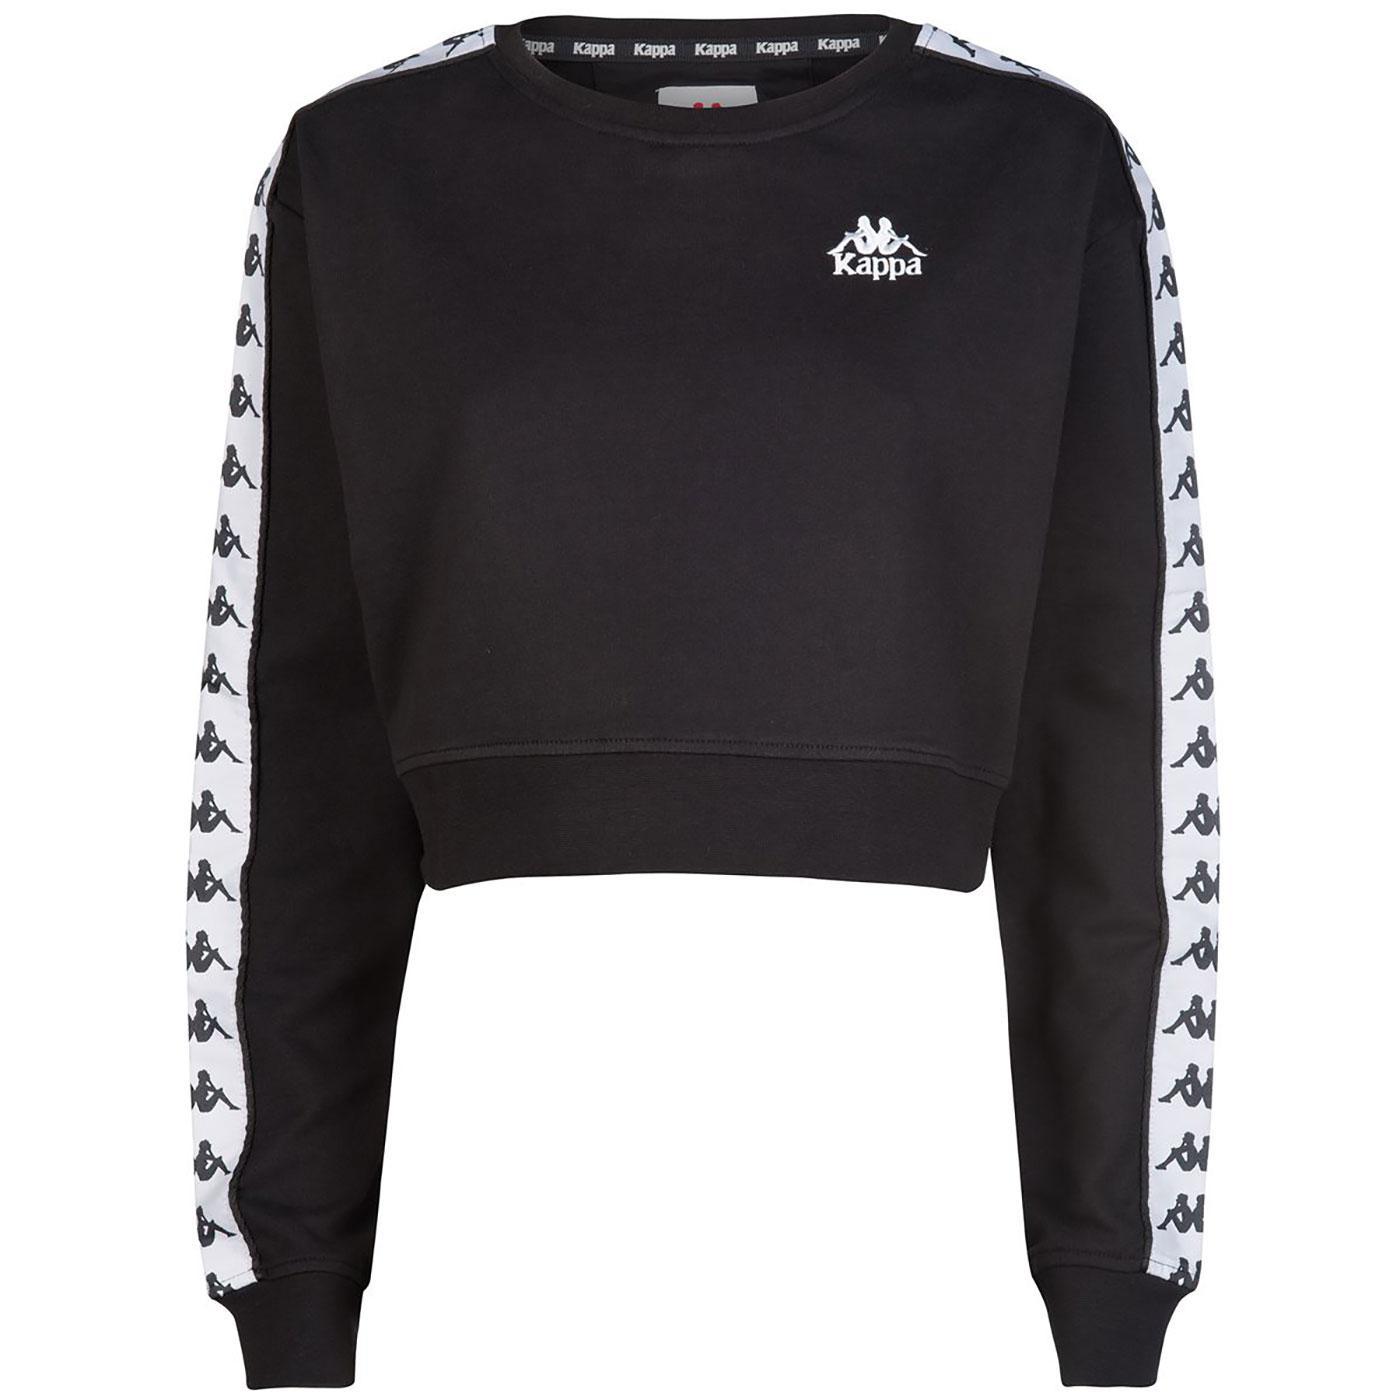 Ays KAPPA Women's Retro 80's Taped Crop Sweatshirt